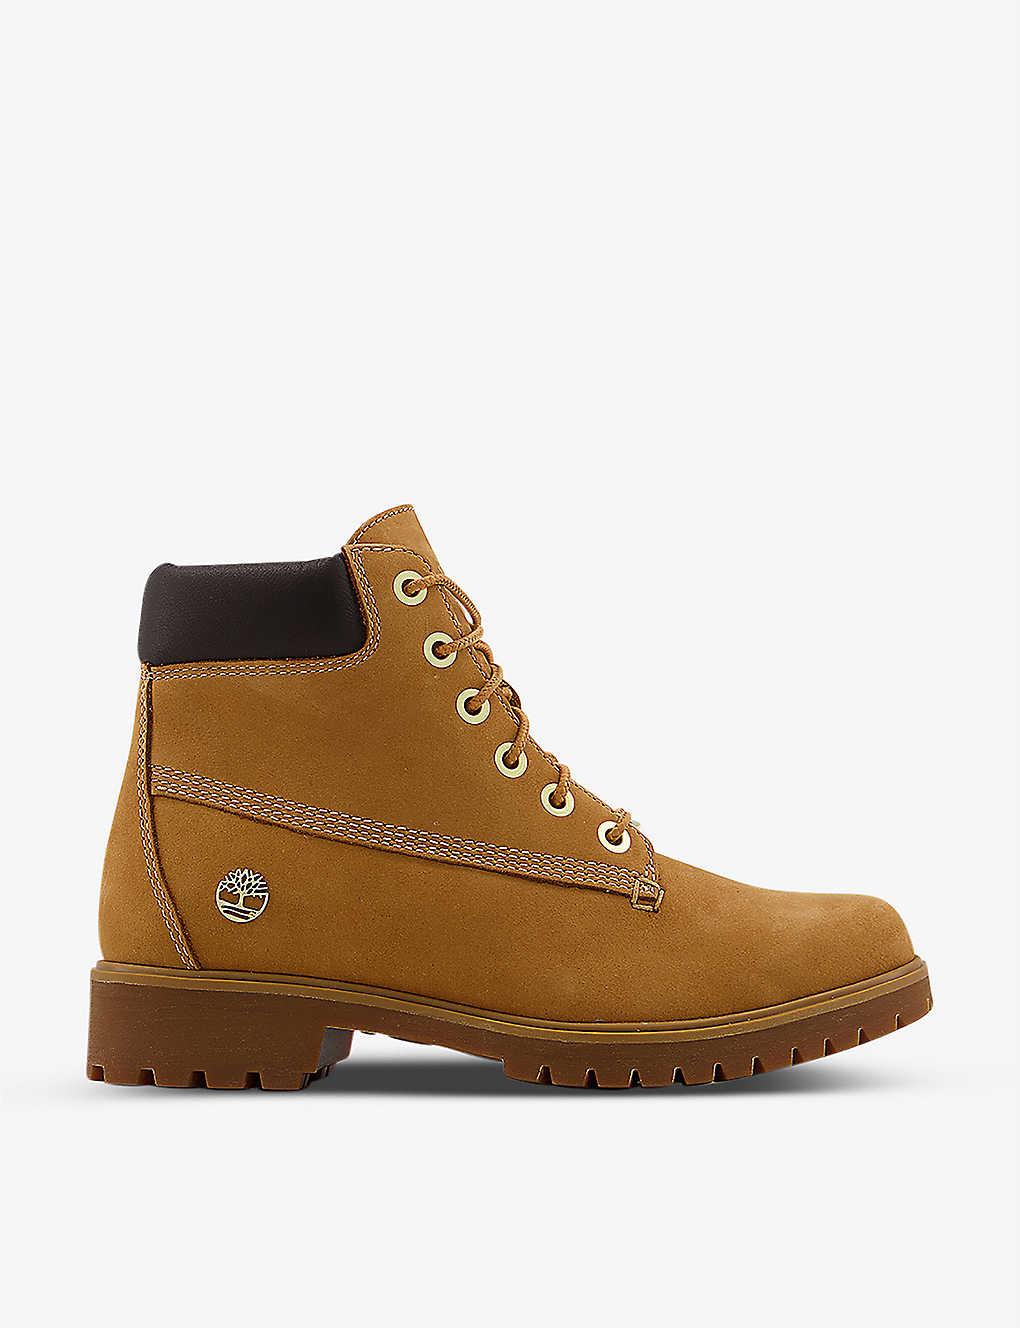 db1273c84a TIMBERLAND - Slim premium leather 6-inch boots | Selfridges.com